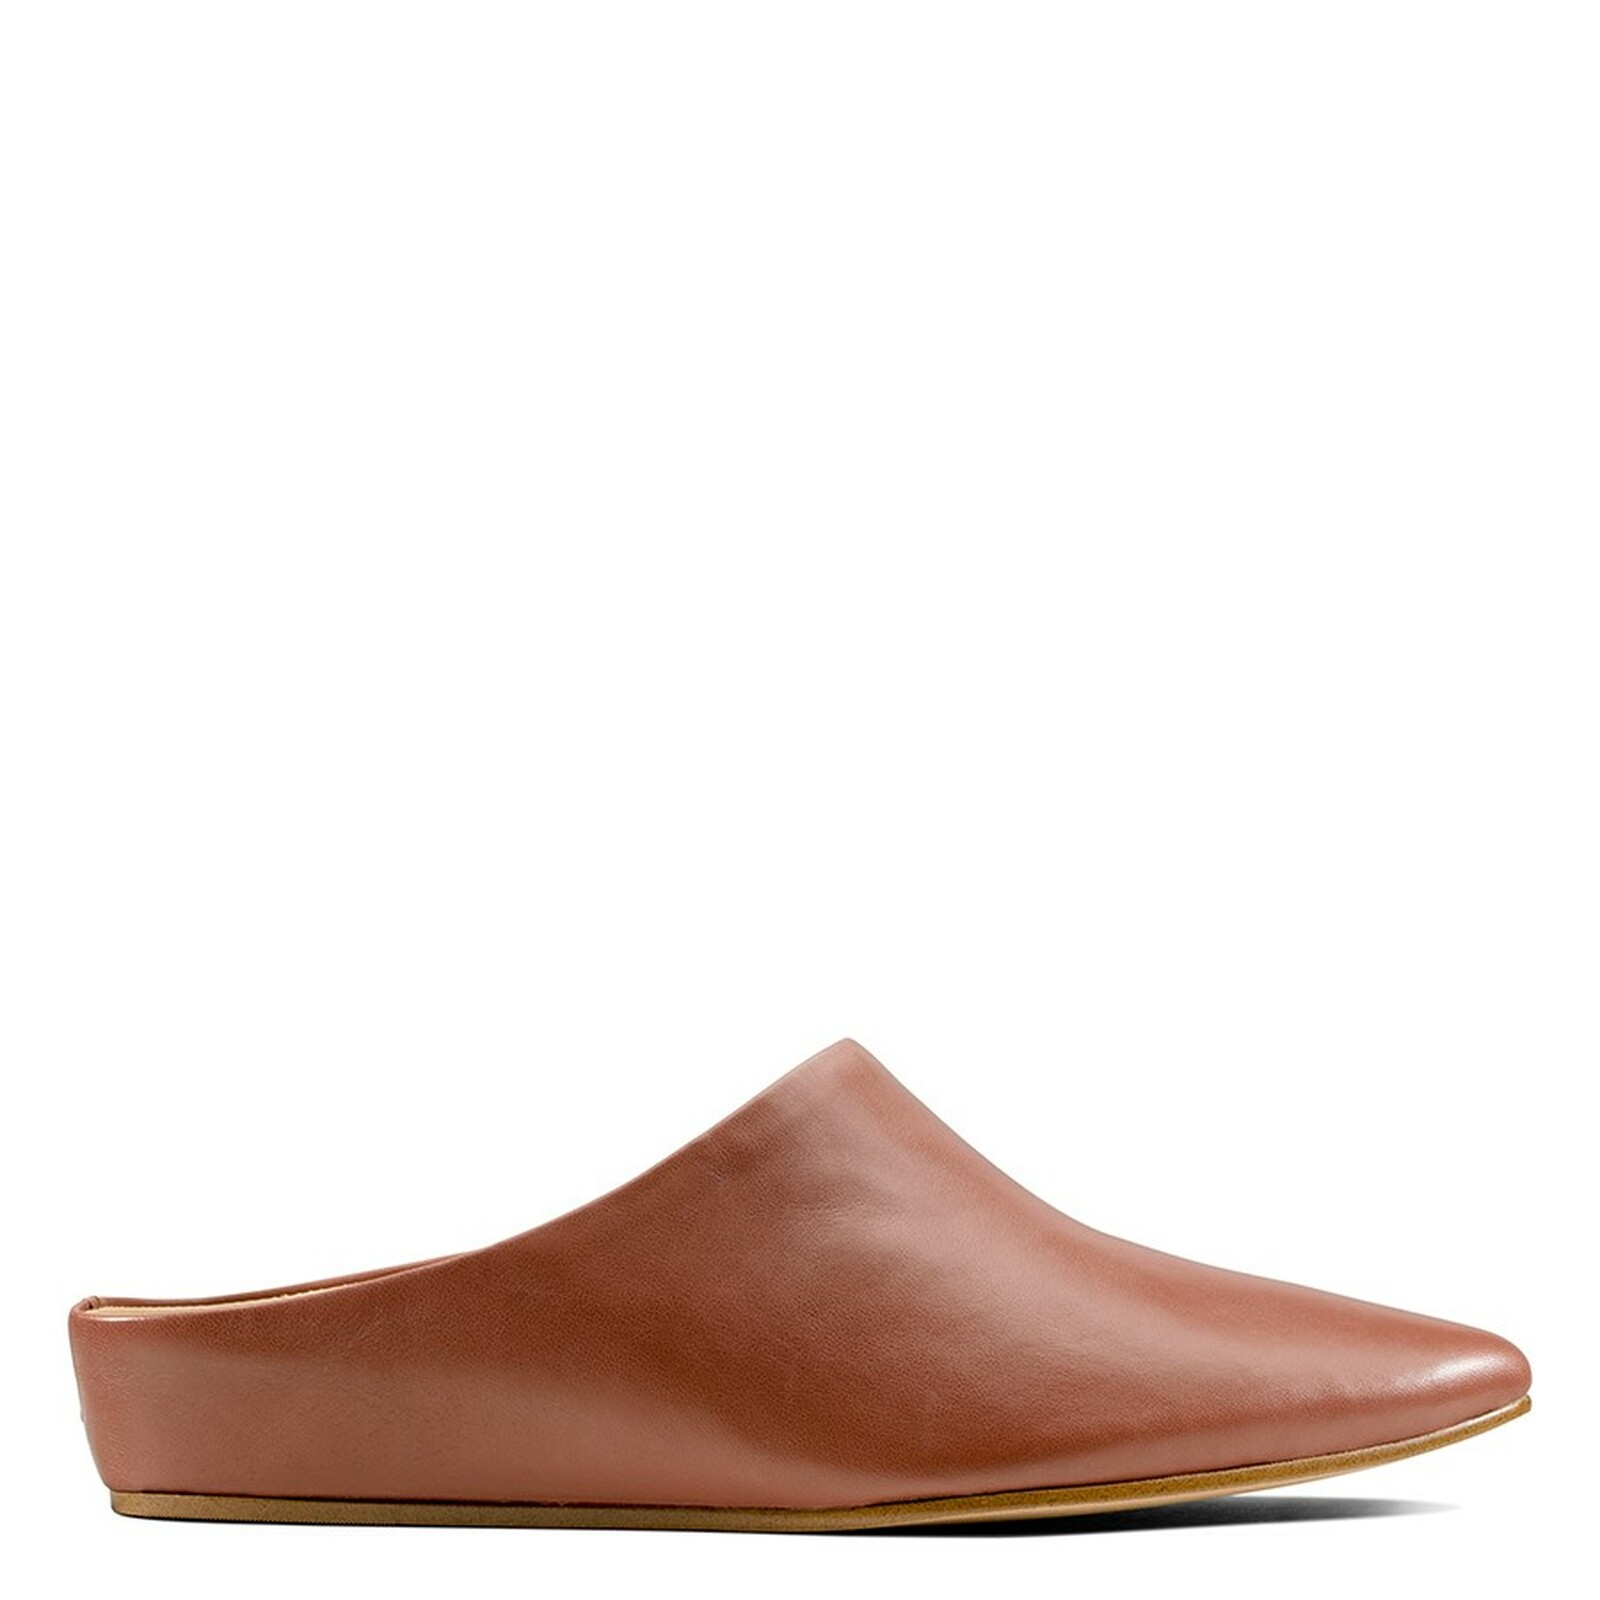 Clarks Womens SENSE BEAU Tan Leather